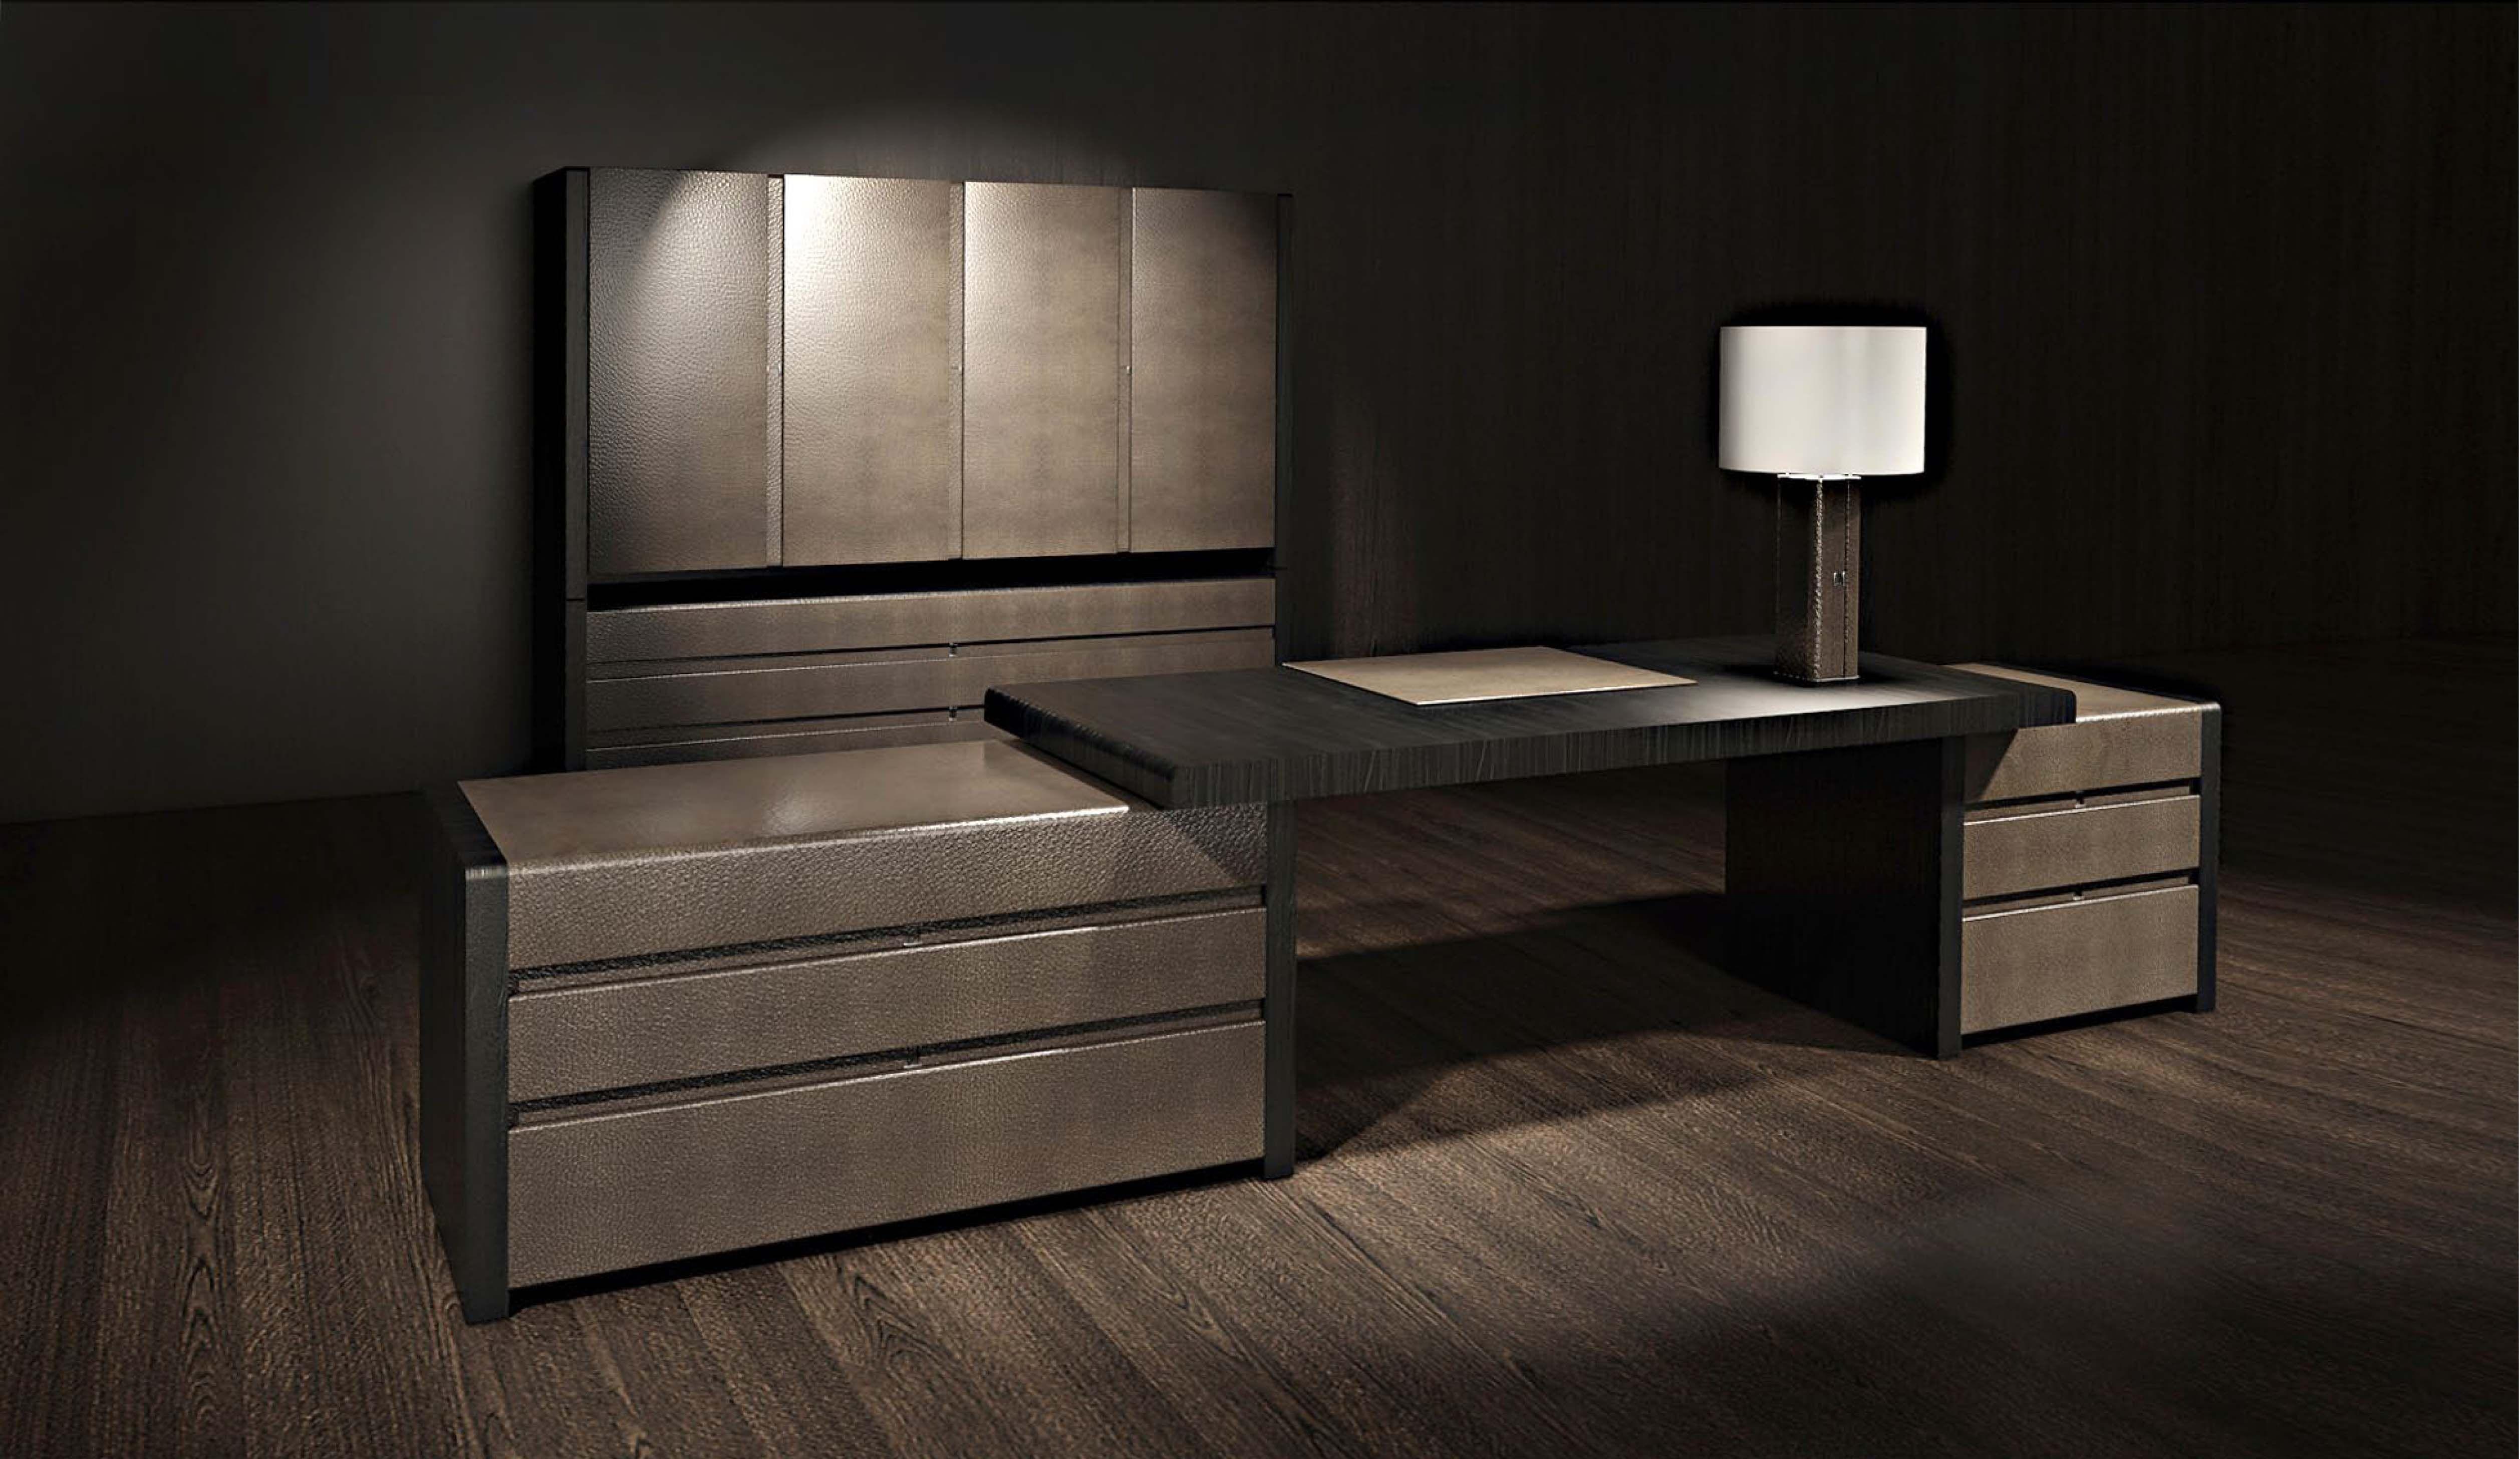 Boss s Cabin offers a wide range of modular office furniture